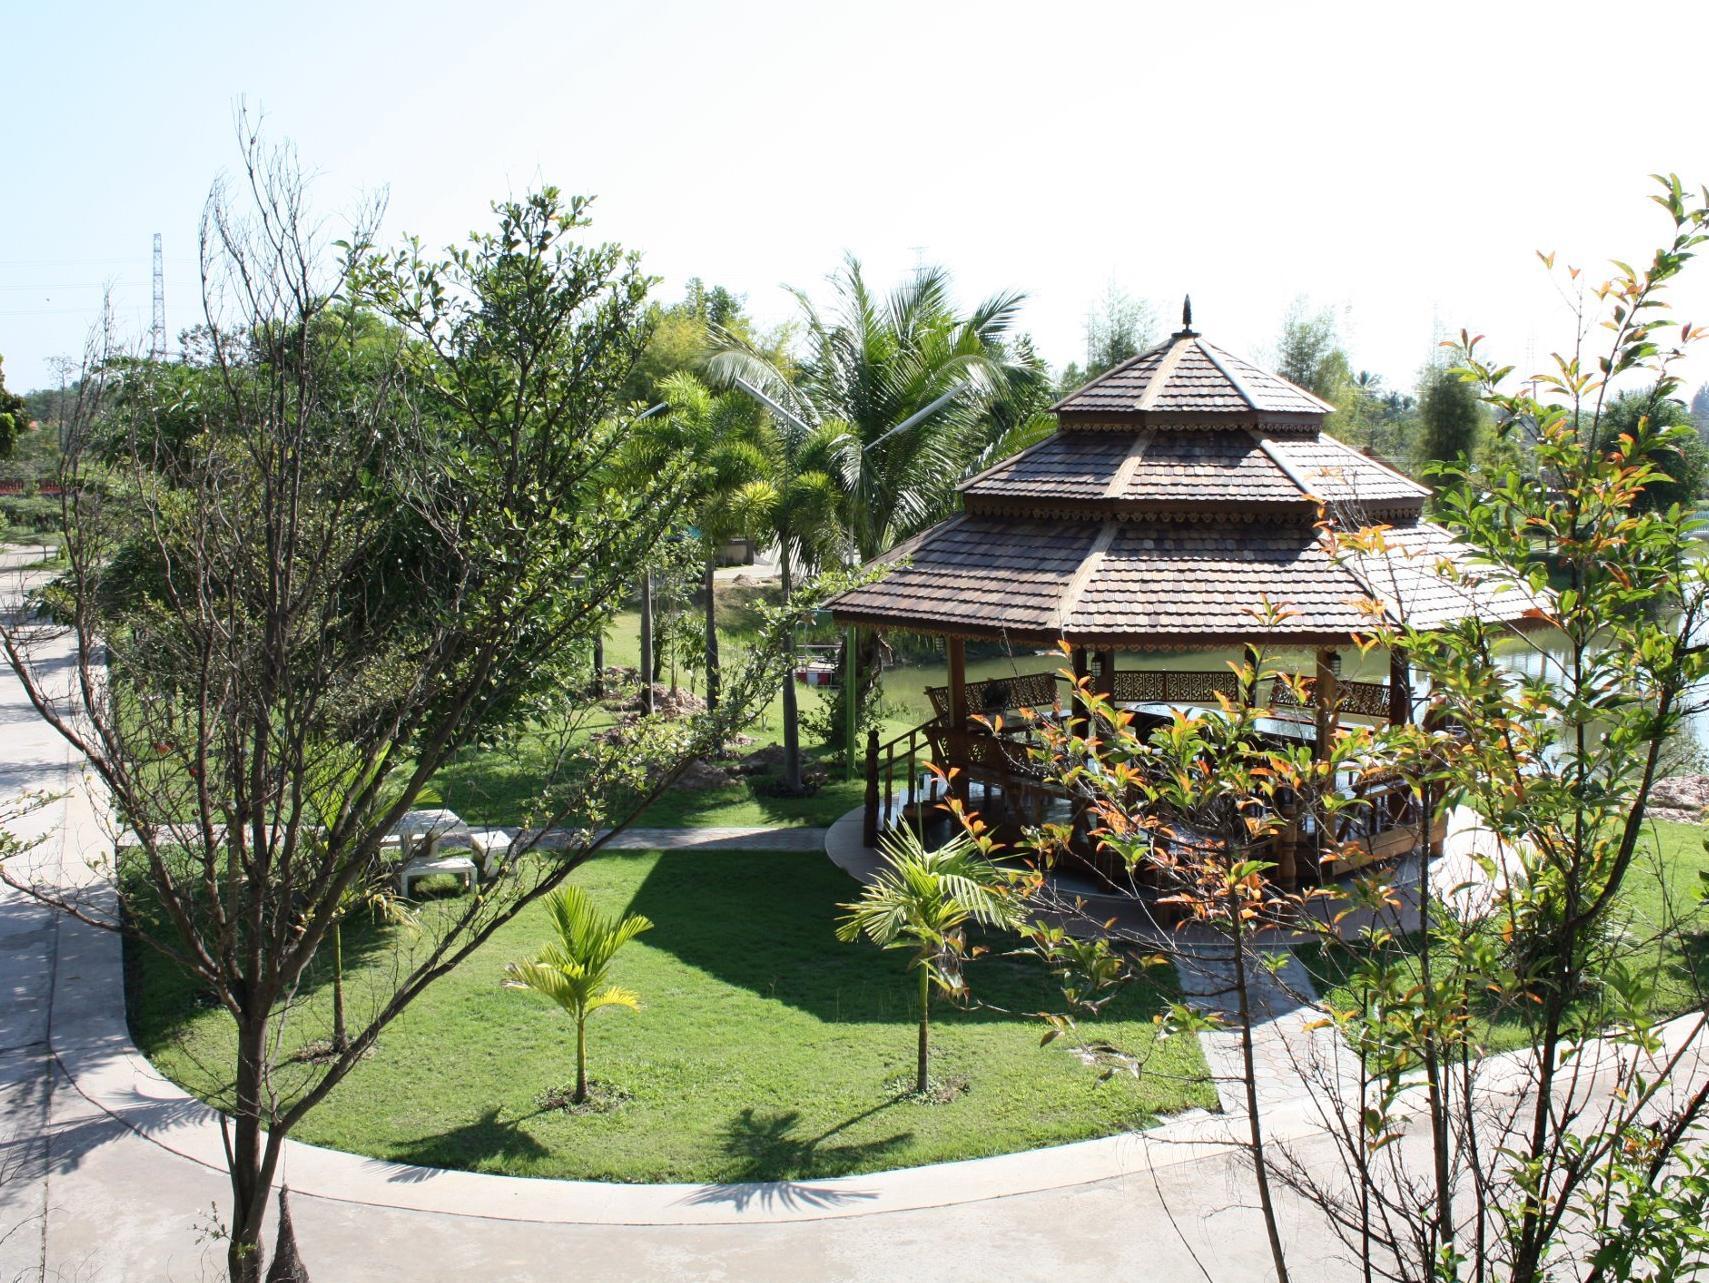 Bangchak Phuphan Resort,โรงแรม บางจาก ภูพาน รีสอร์ต